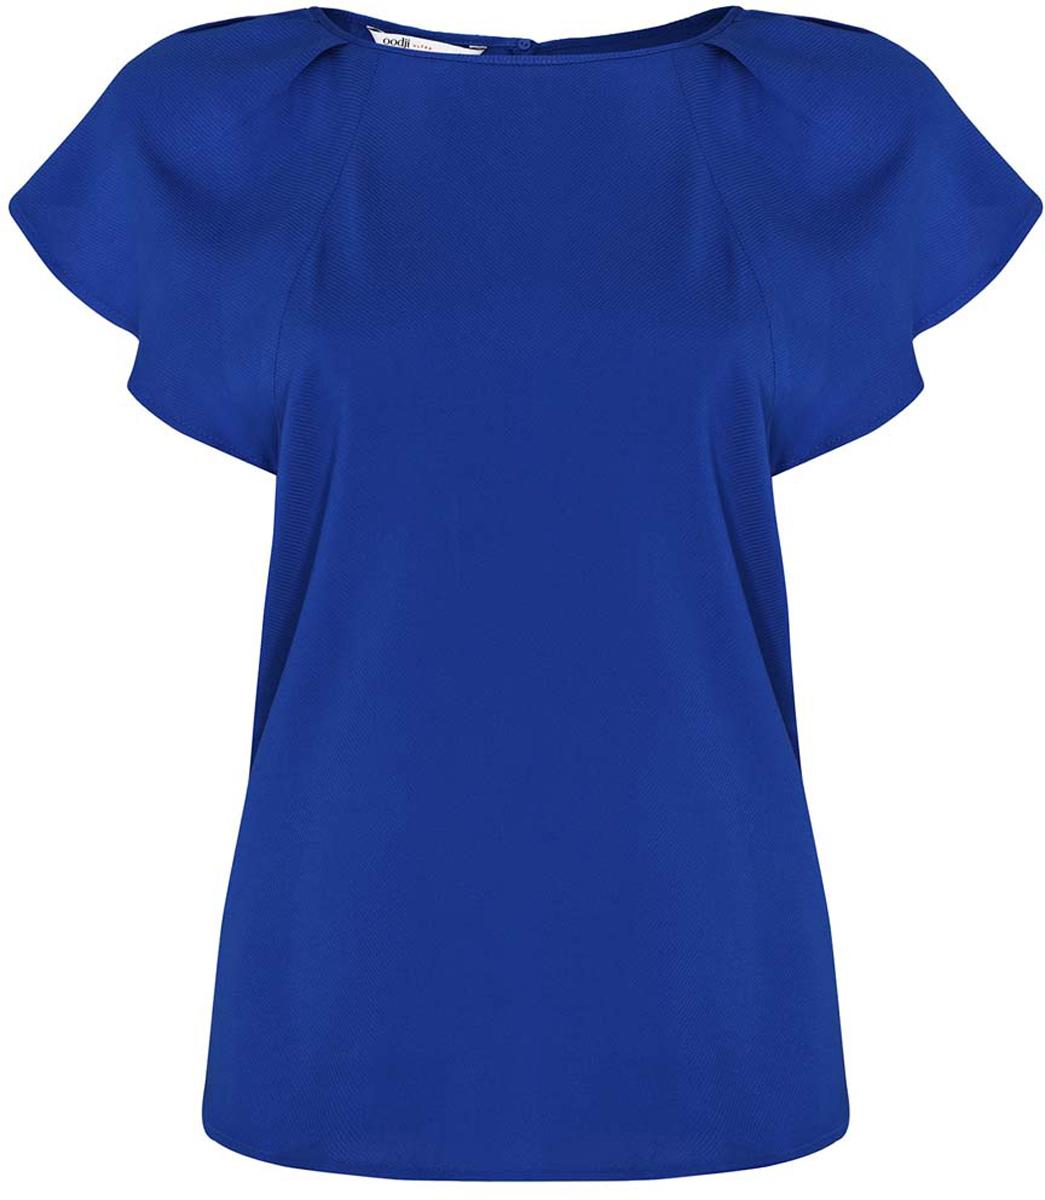 Блузка oodji карамелли карамелли блузка для школы с крылышками белая